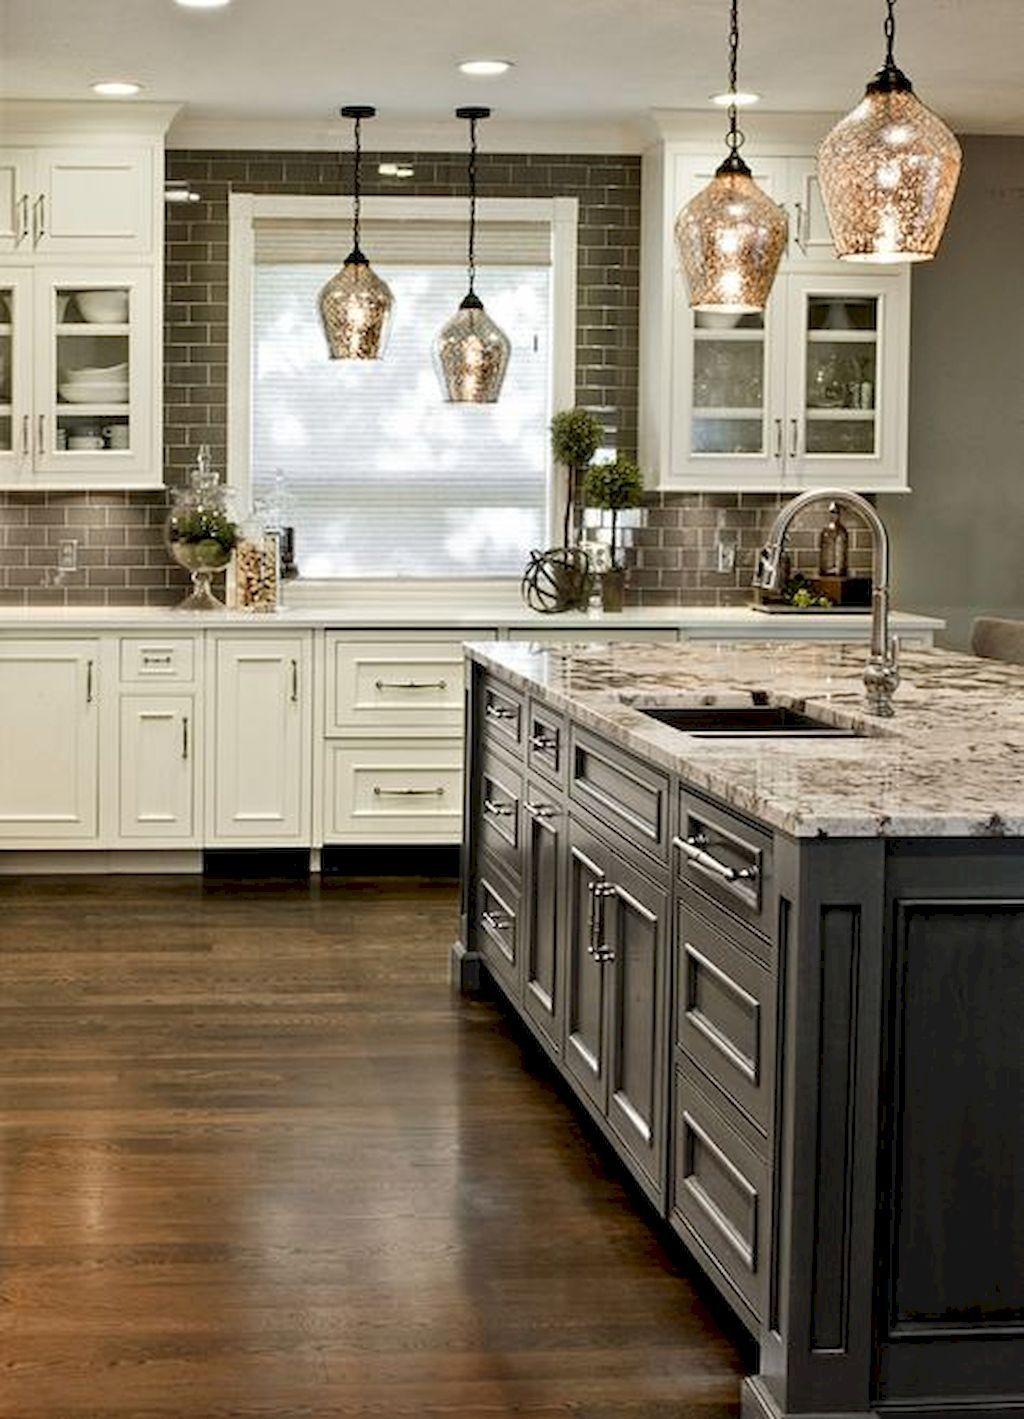 60 great kitchen design ideas modern kitchen design on best farmhouse kitchen decor ideas and remodel create your dreams id=24540